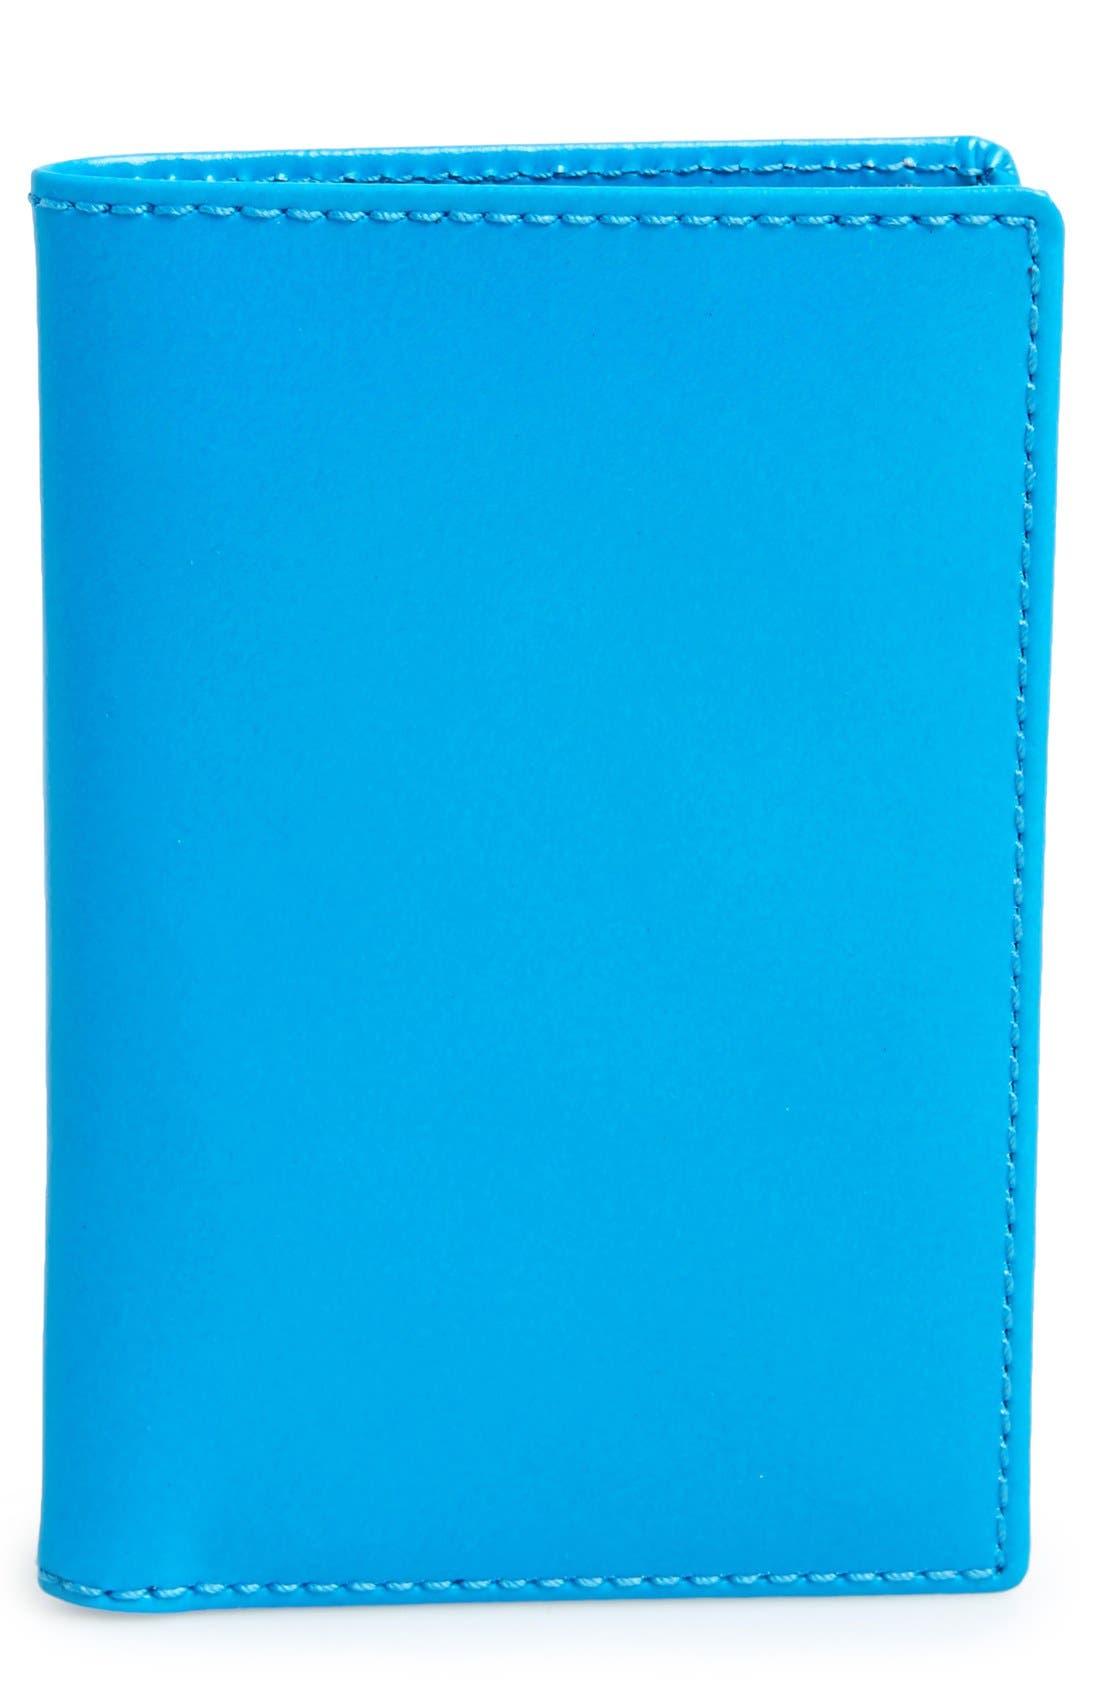 Alternate Image 1 Selected - Comme des Garçons 'Super Fluo' Leather Card Case